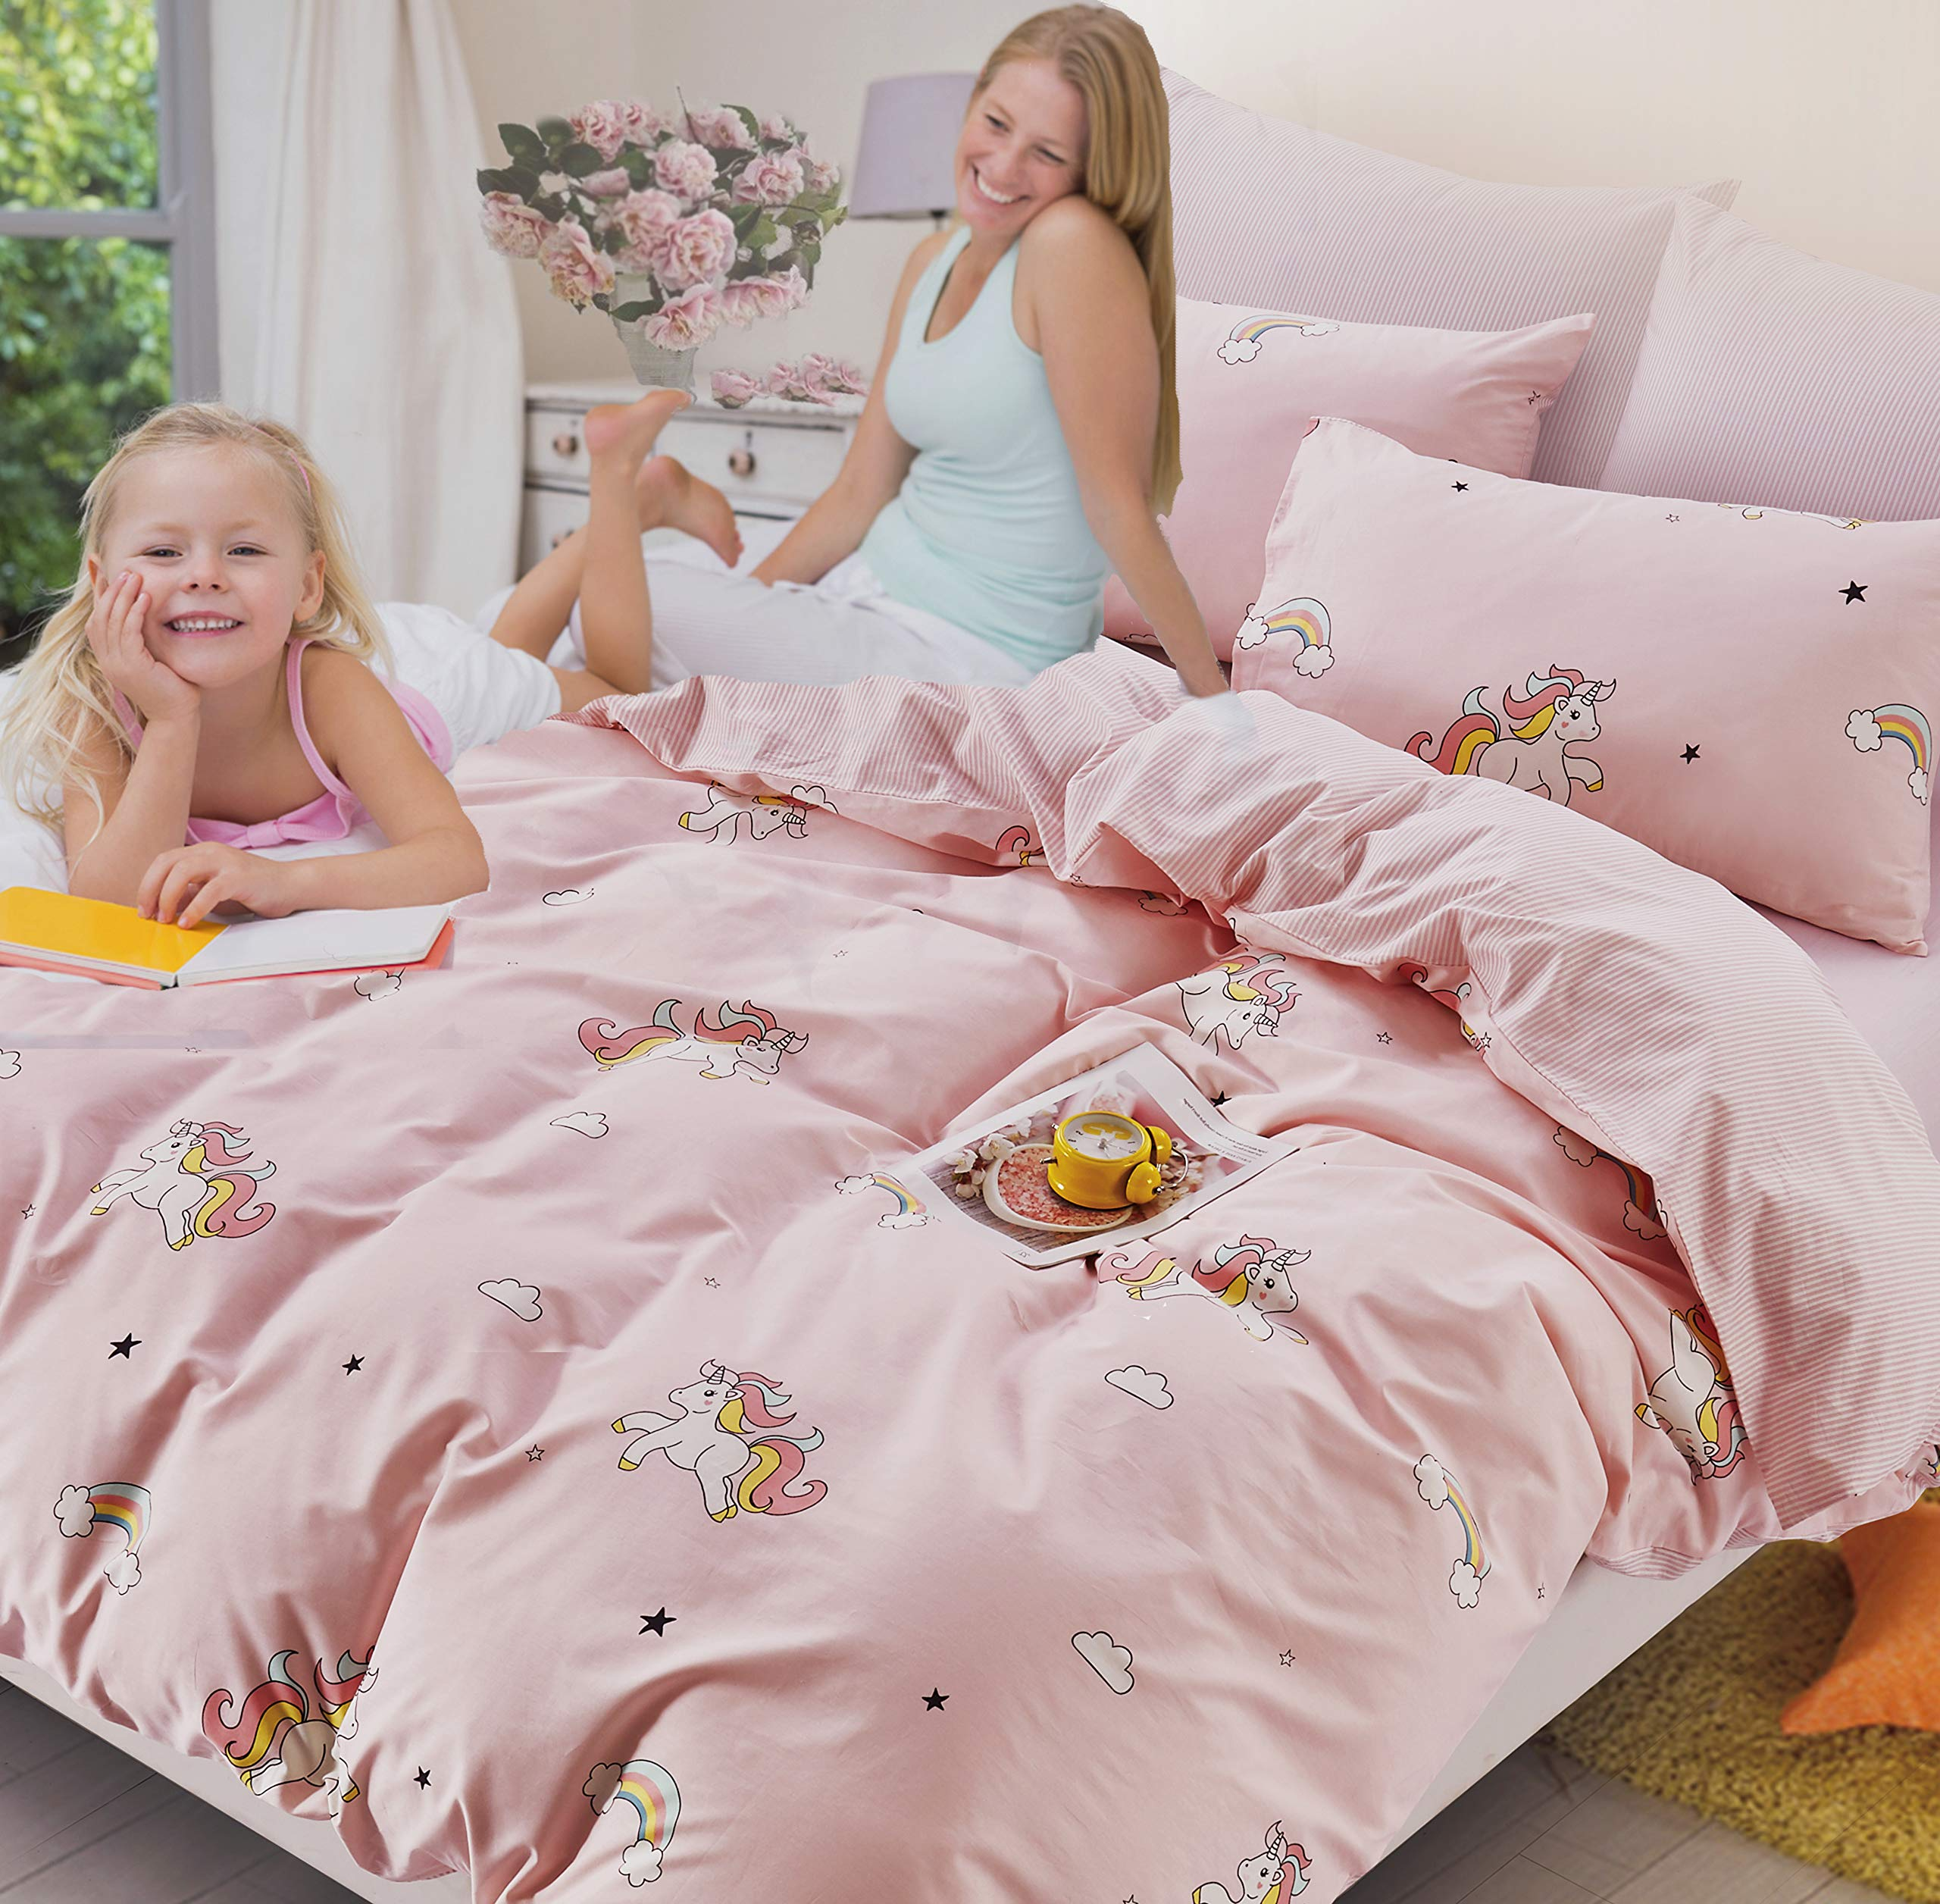 ELLE & KAY Unicorns Duvet Cover Set/Unicorn Kids Bedding/ 100% Cotton Queen Zipper Bedding/Full Reversible Girls Comforter Cover/ 3 Piece Queen Duvet Cover Set. by ELLE & KAY (Image #3)